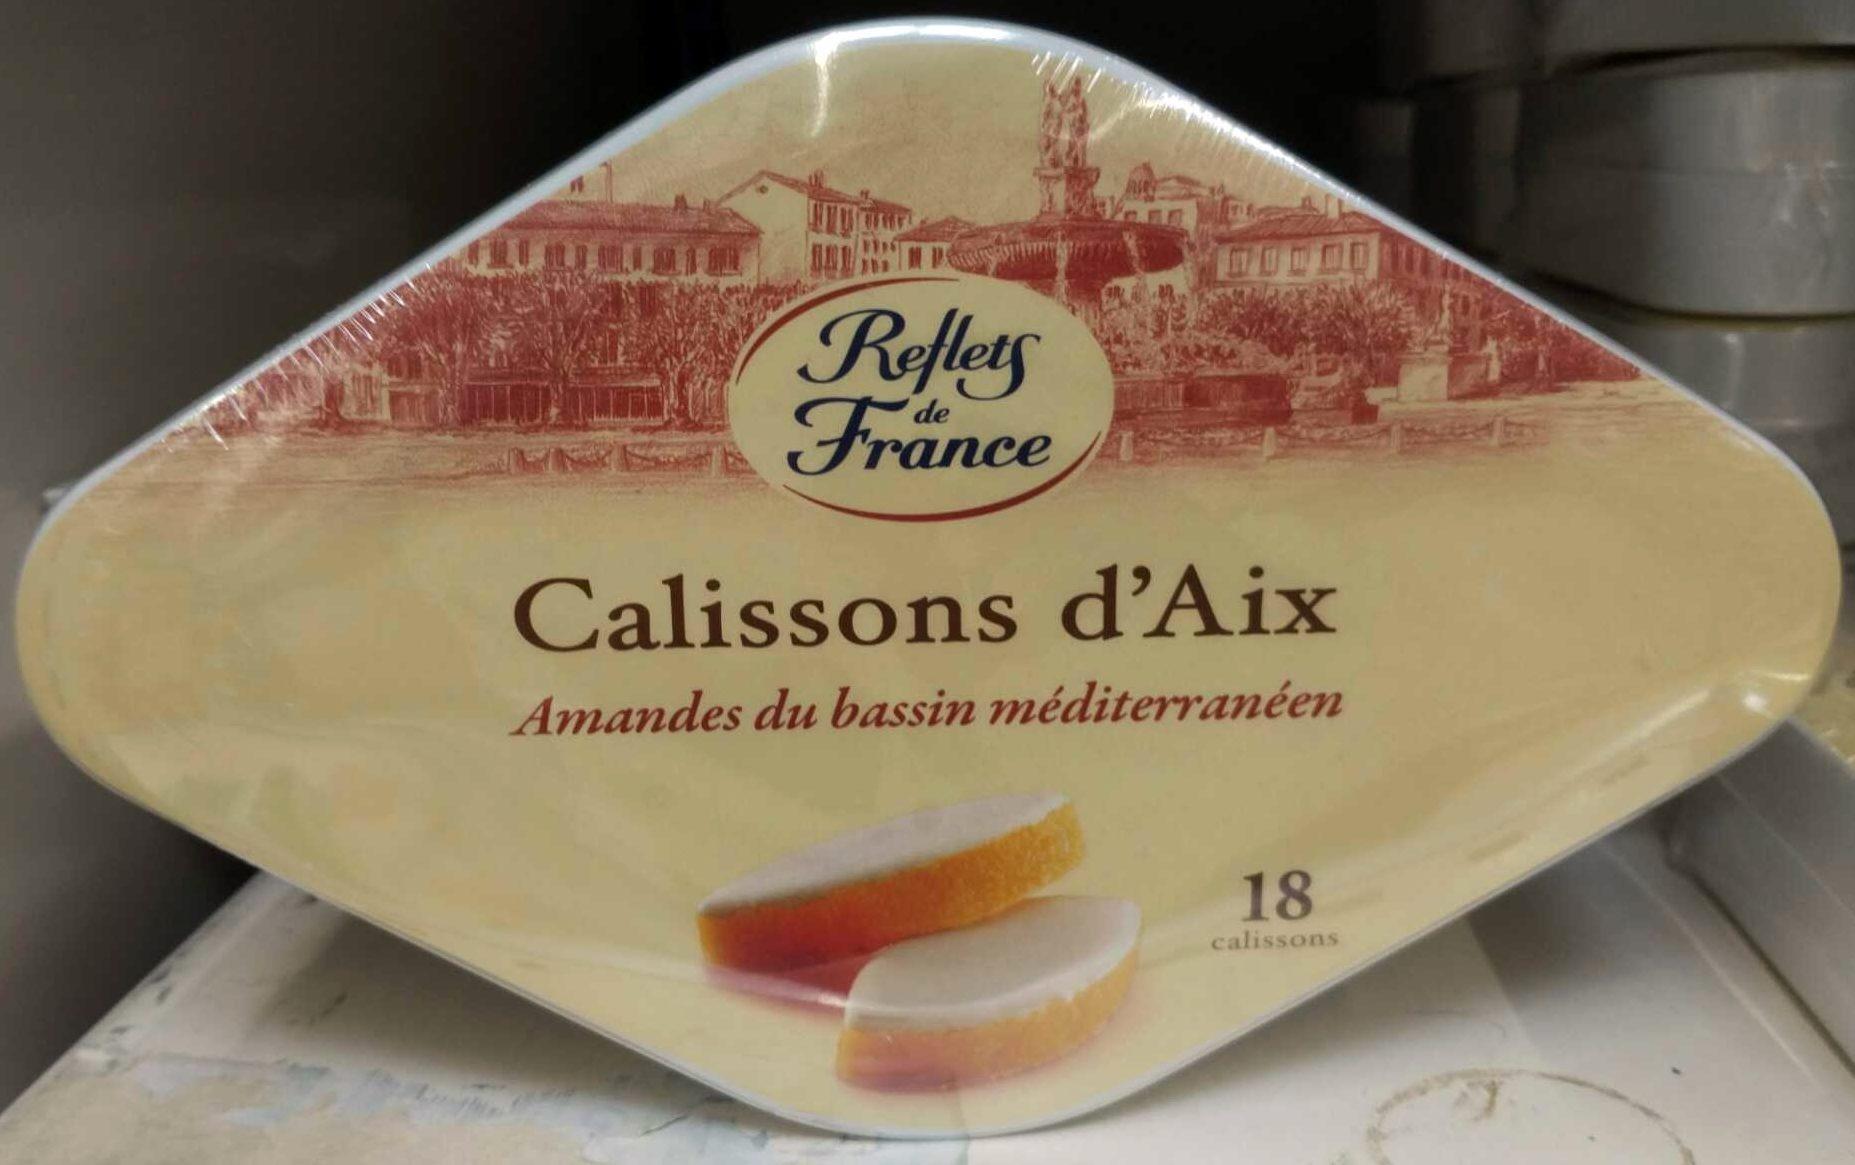 Calissons d'Aix Amandes du bassin méditerranéen - Product